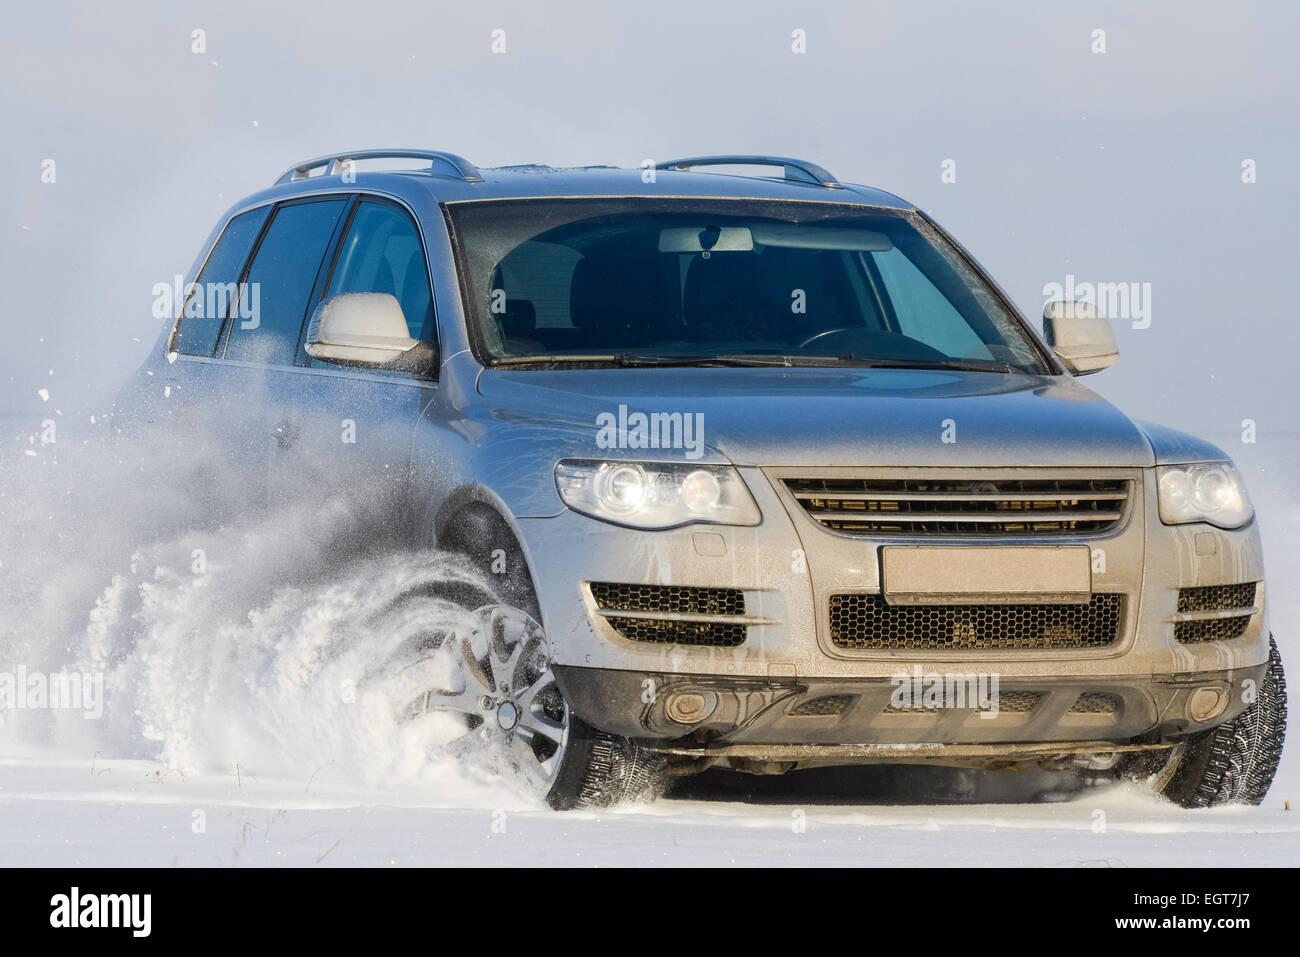 Car offroad spray snow - Stock Image